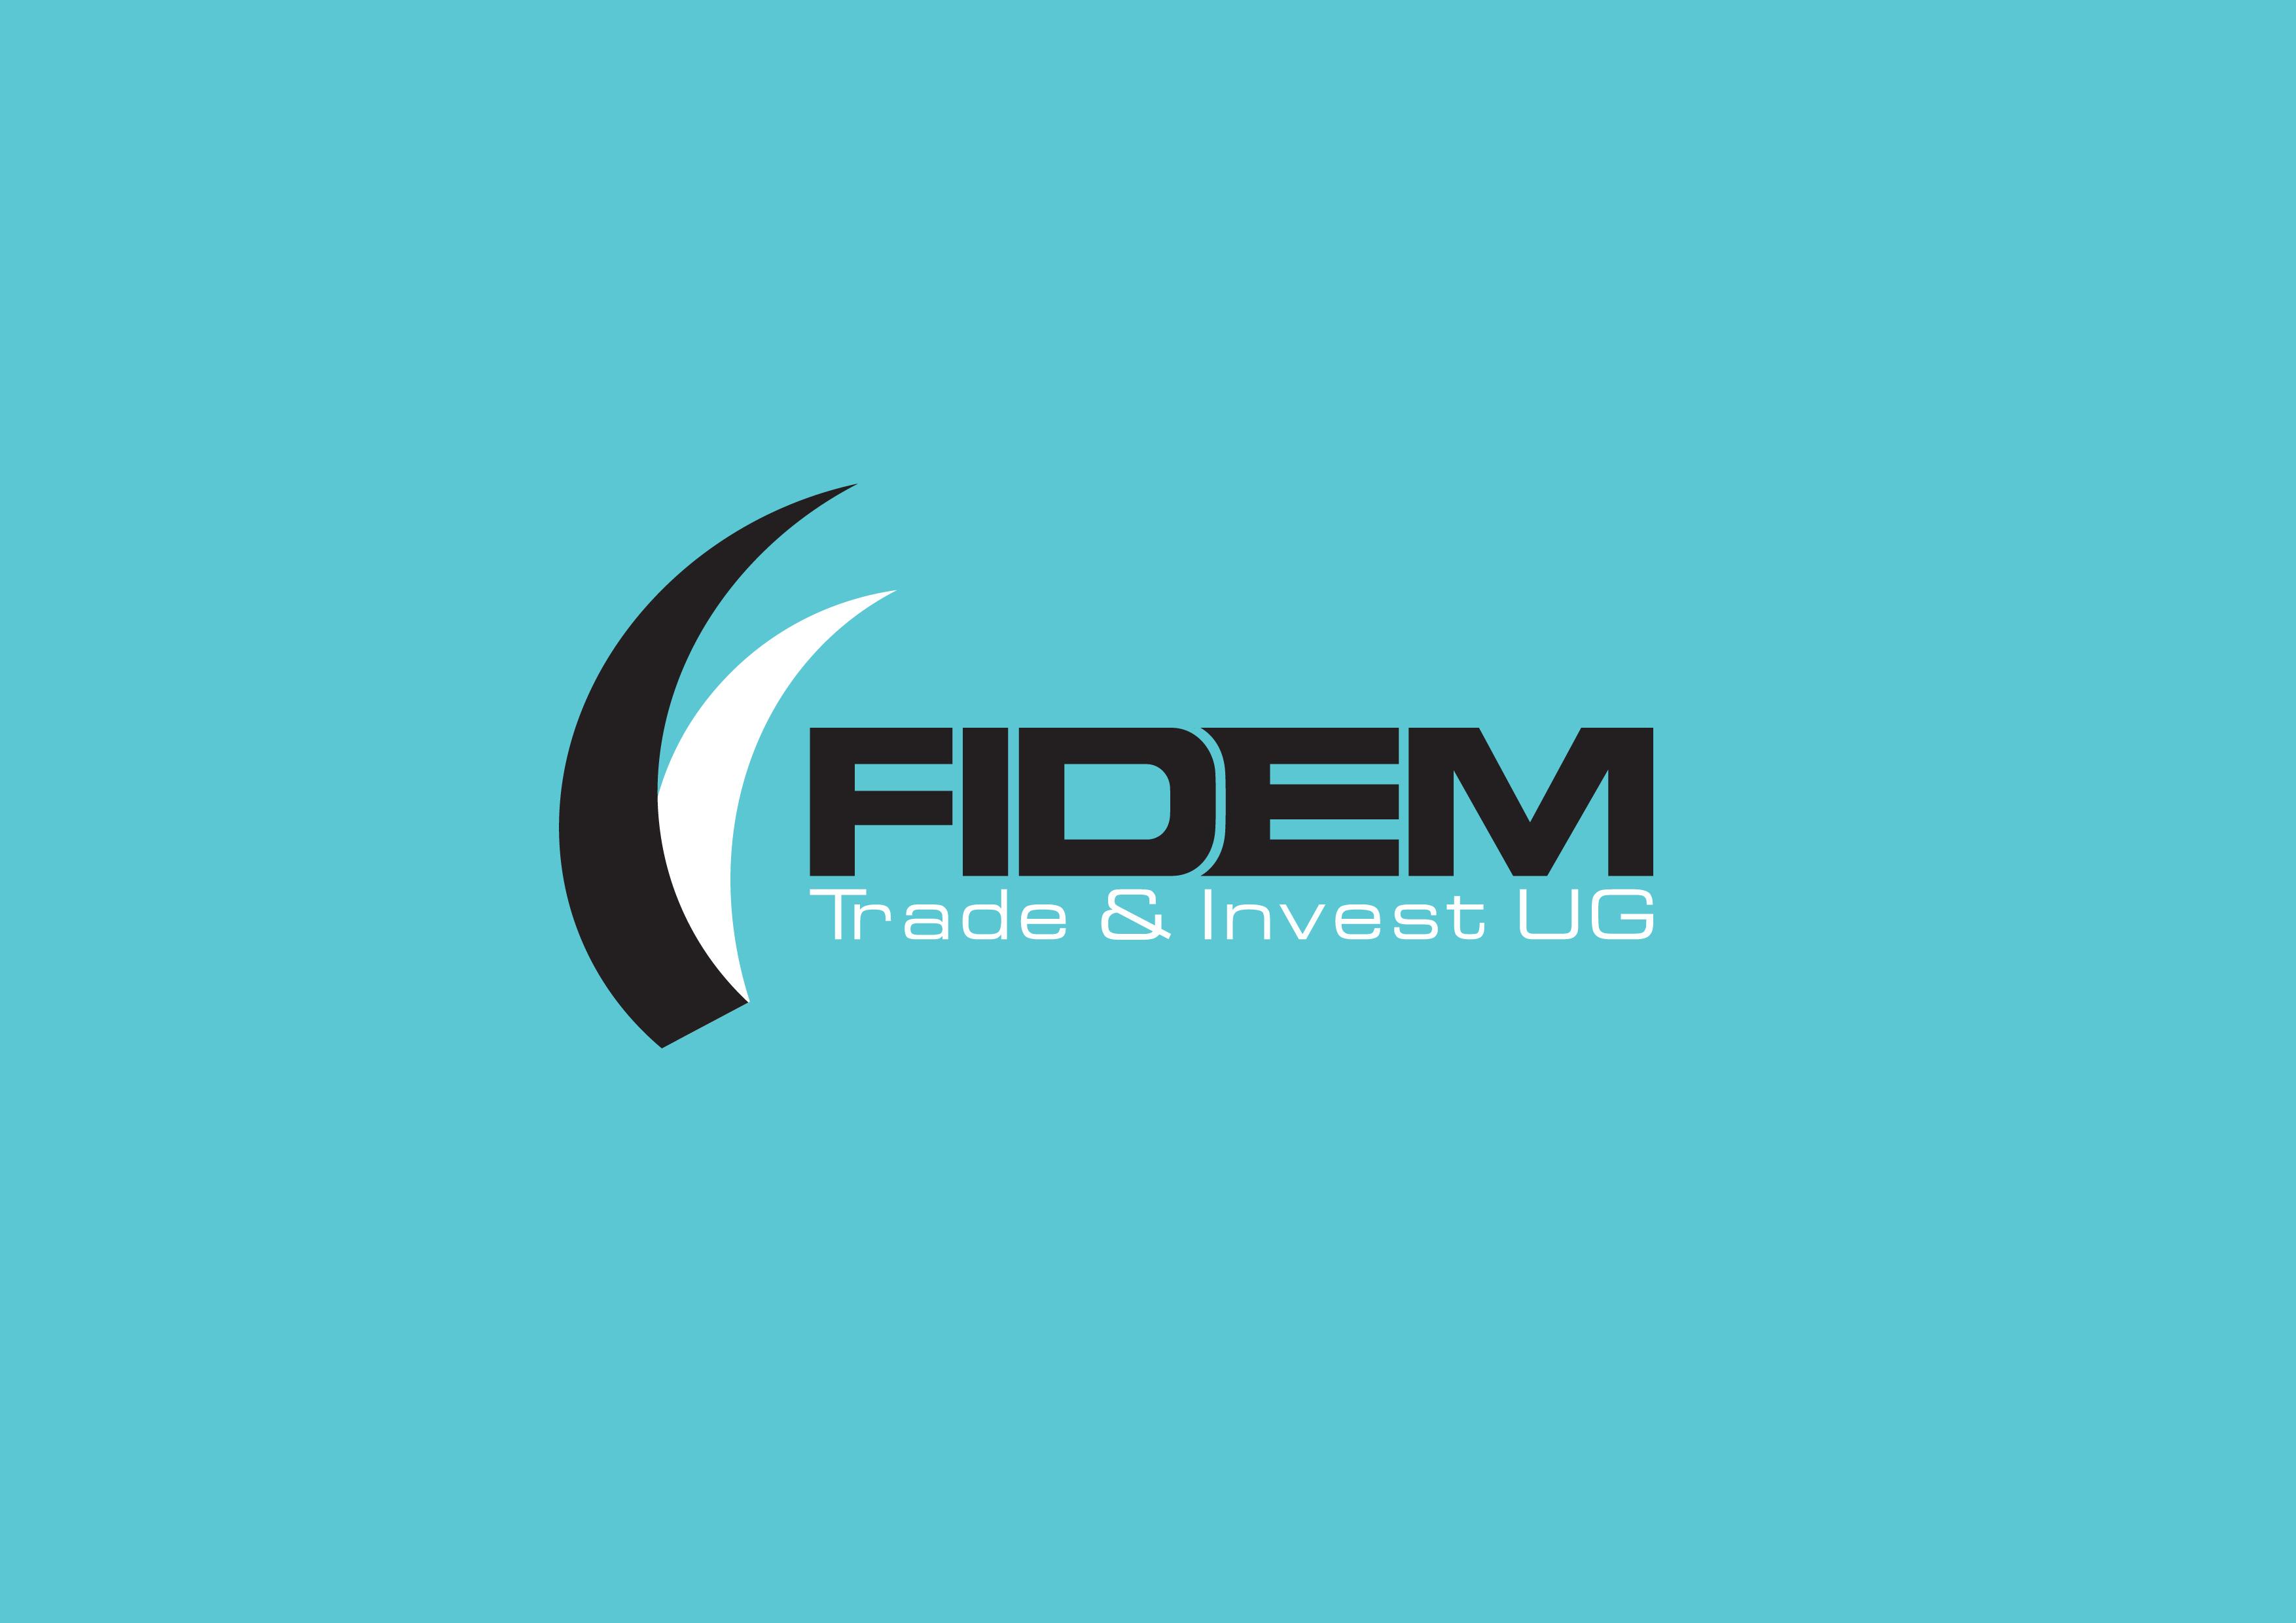 Logo Design by 3draw - Entry No. 694 in the Logo Design Contest Professional Logo Design for FIDEM Trade & Invest UG.